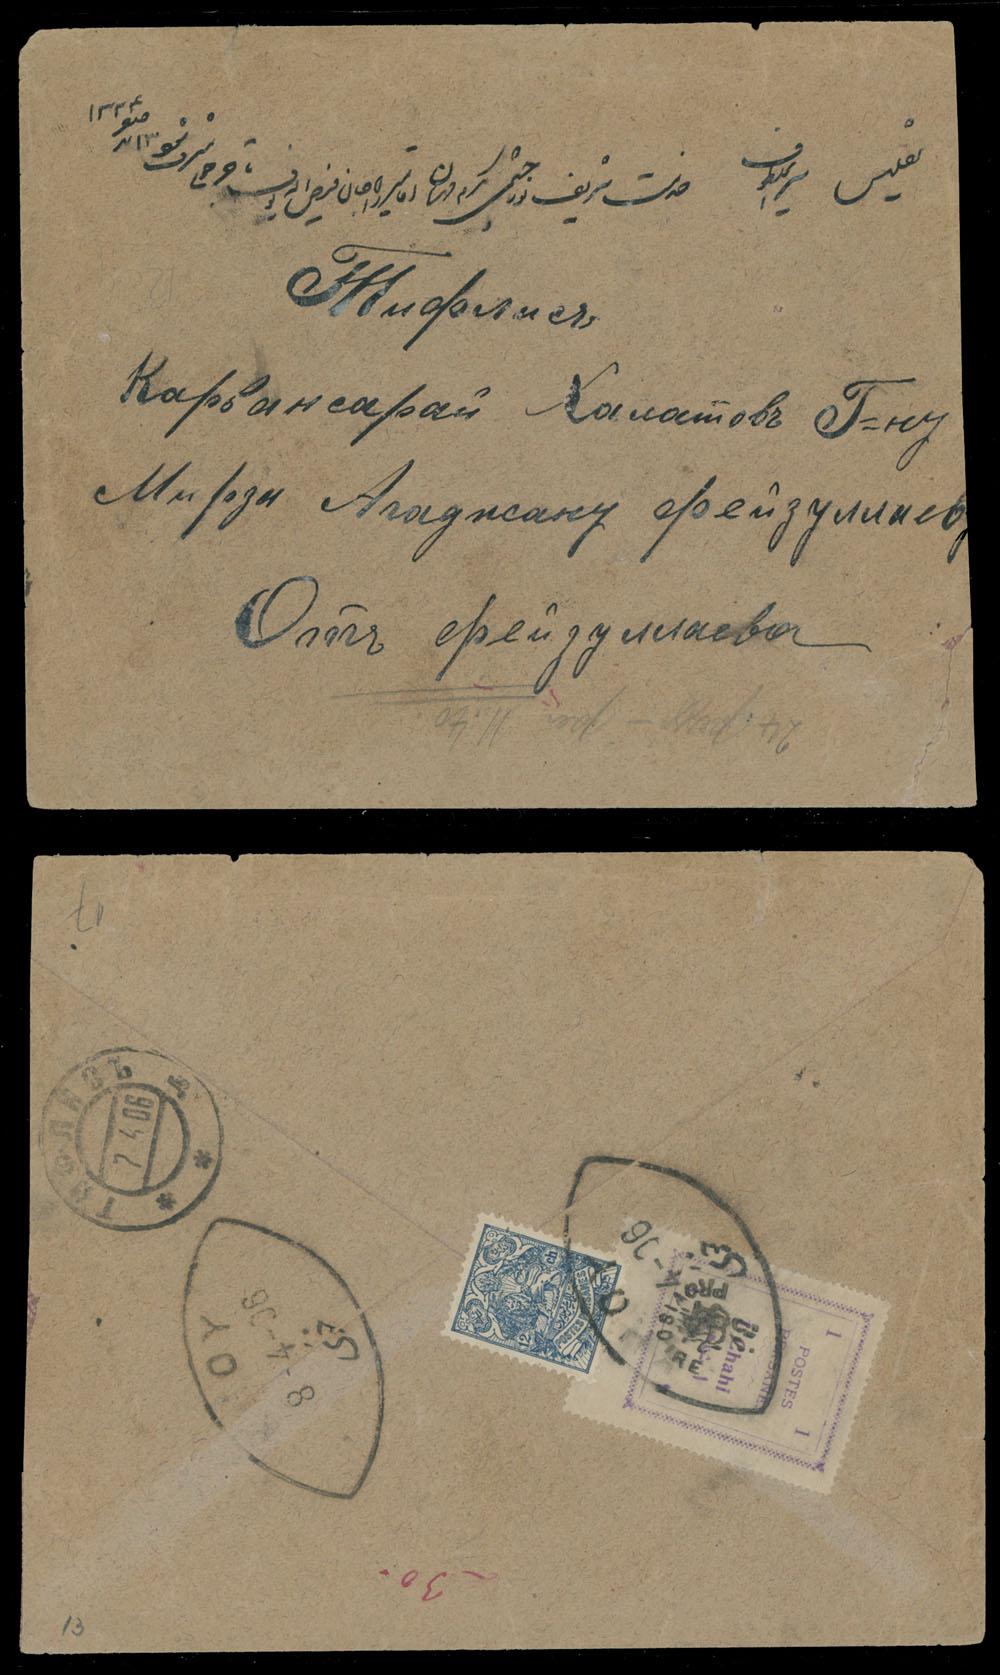 Lot 734 - iran Persian Postal History -  Raritan Stamps Inc. Live Bidding Auction #81